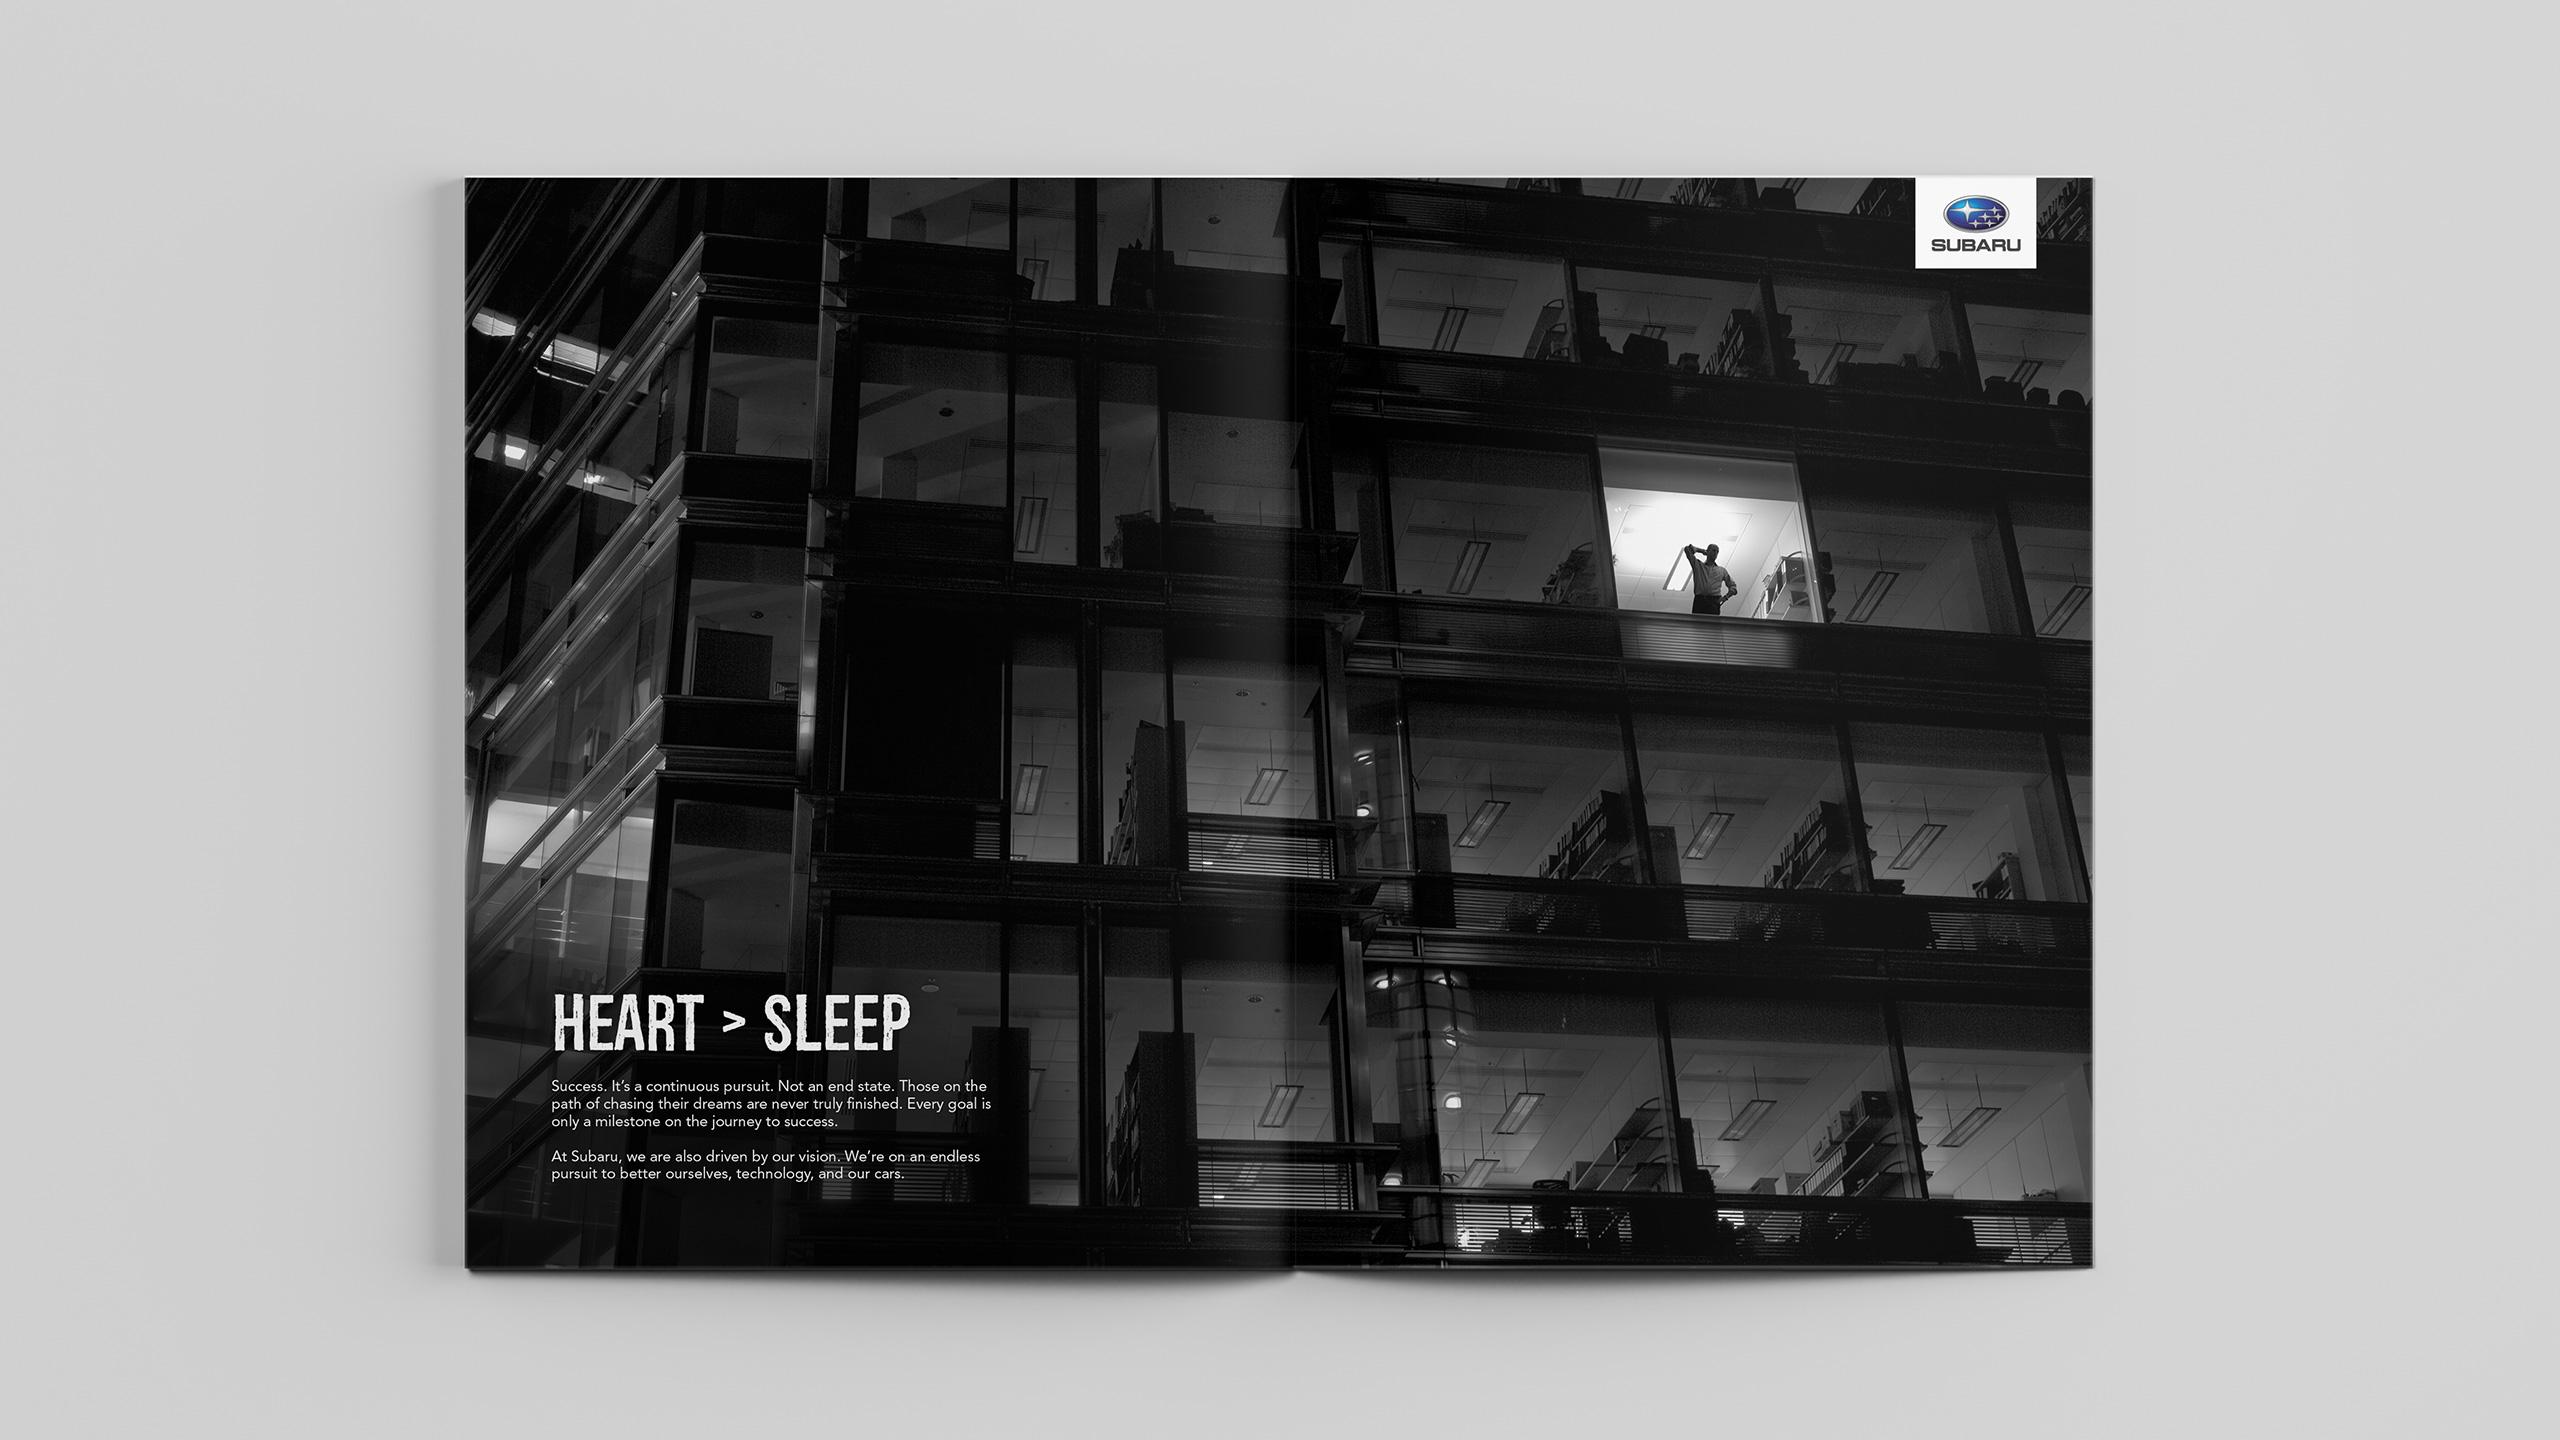 ad-allheart-panel-2